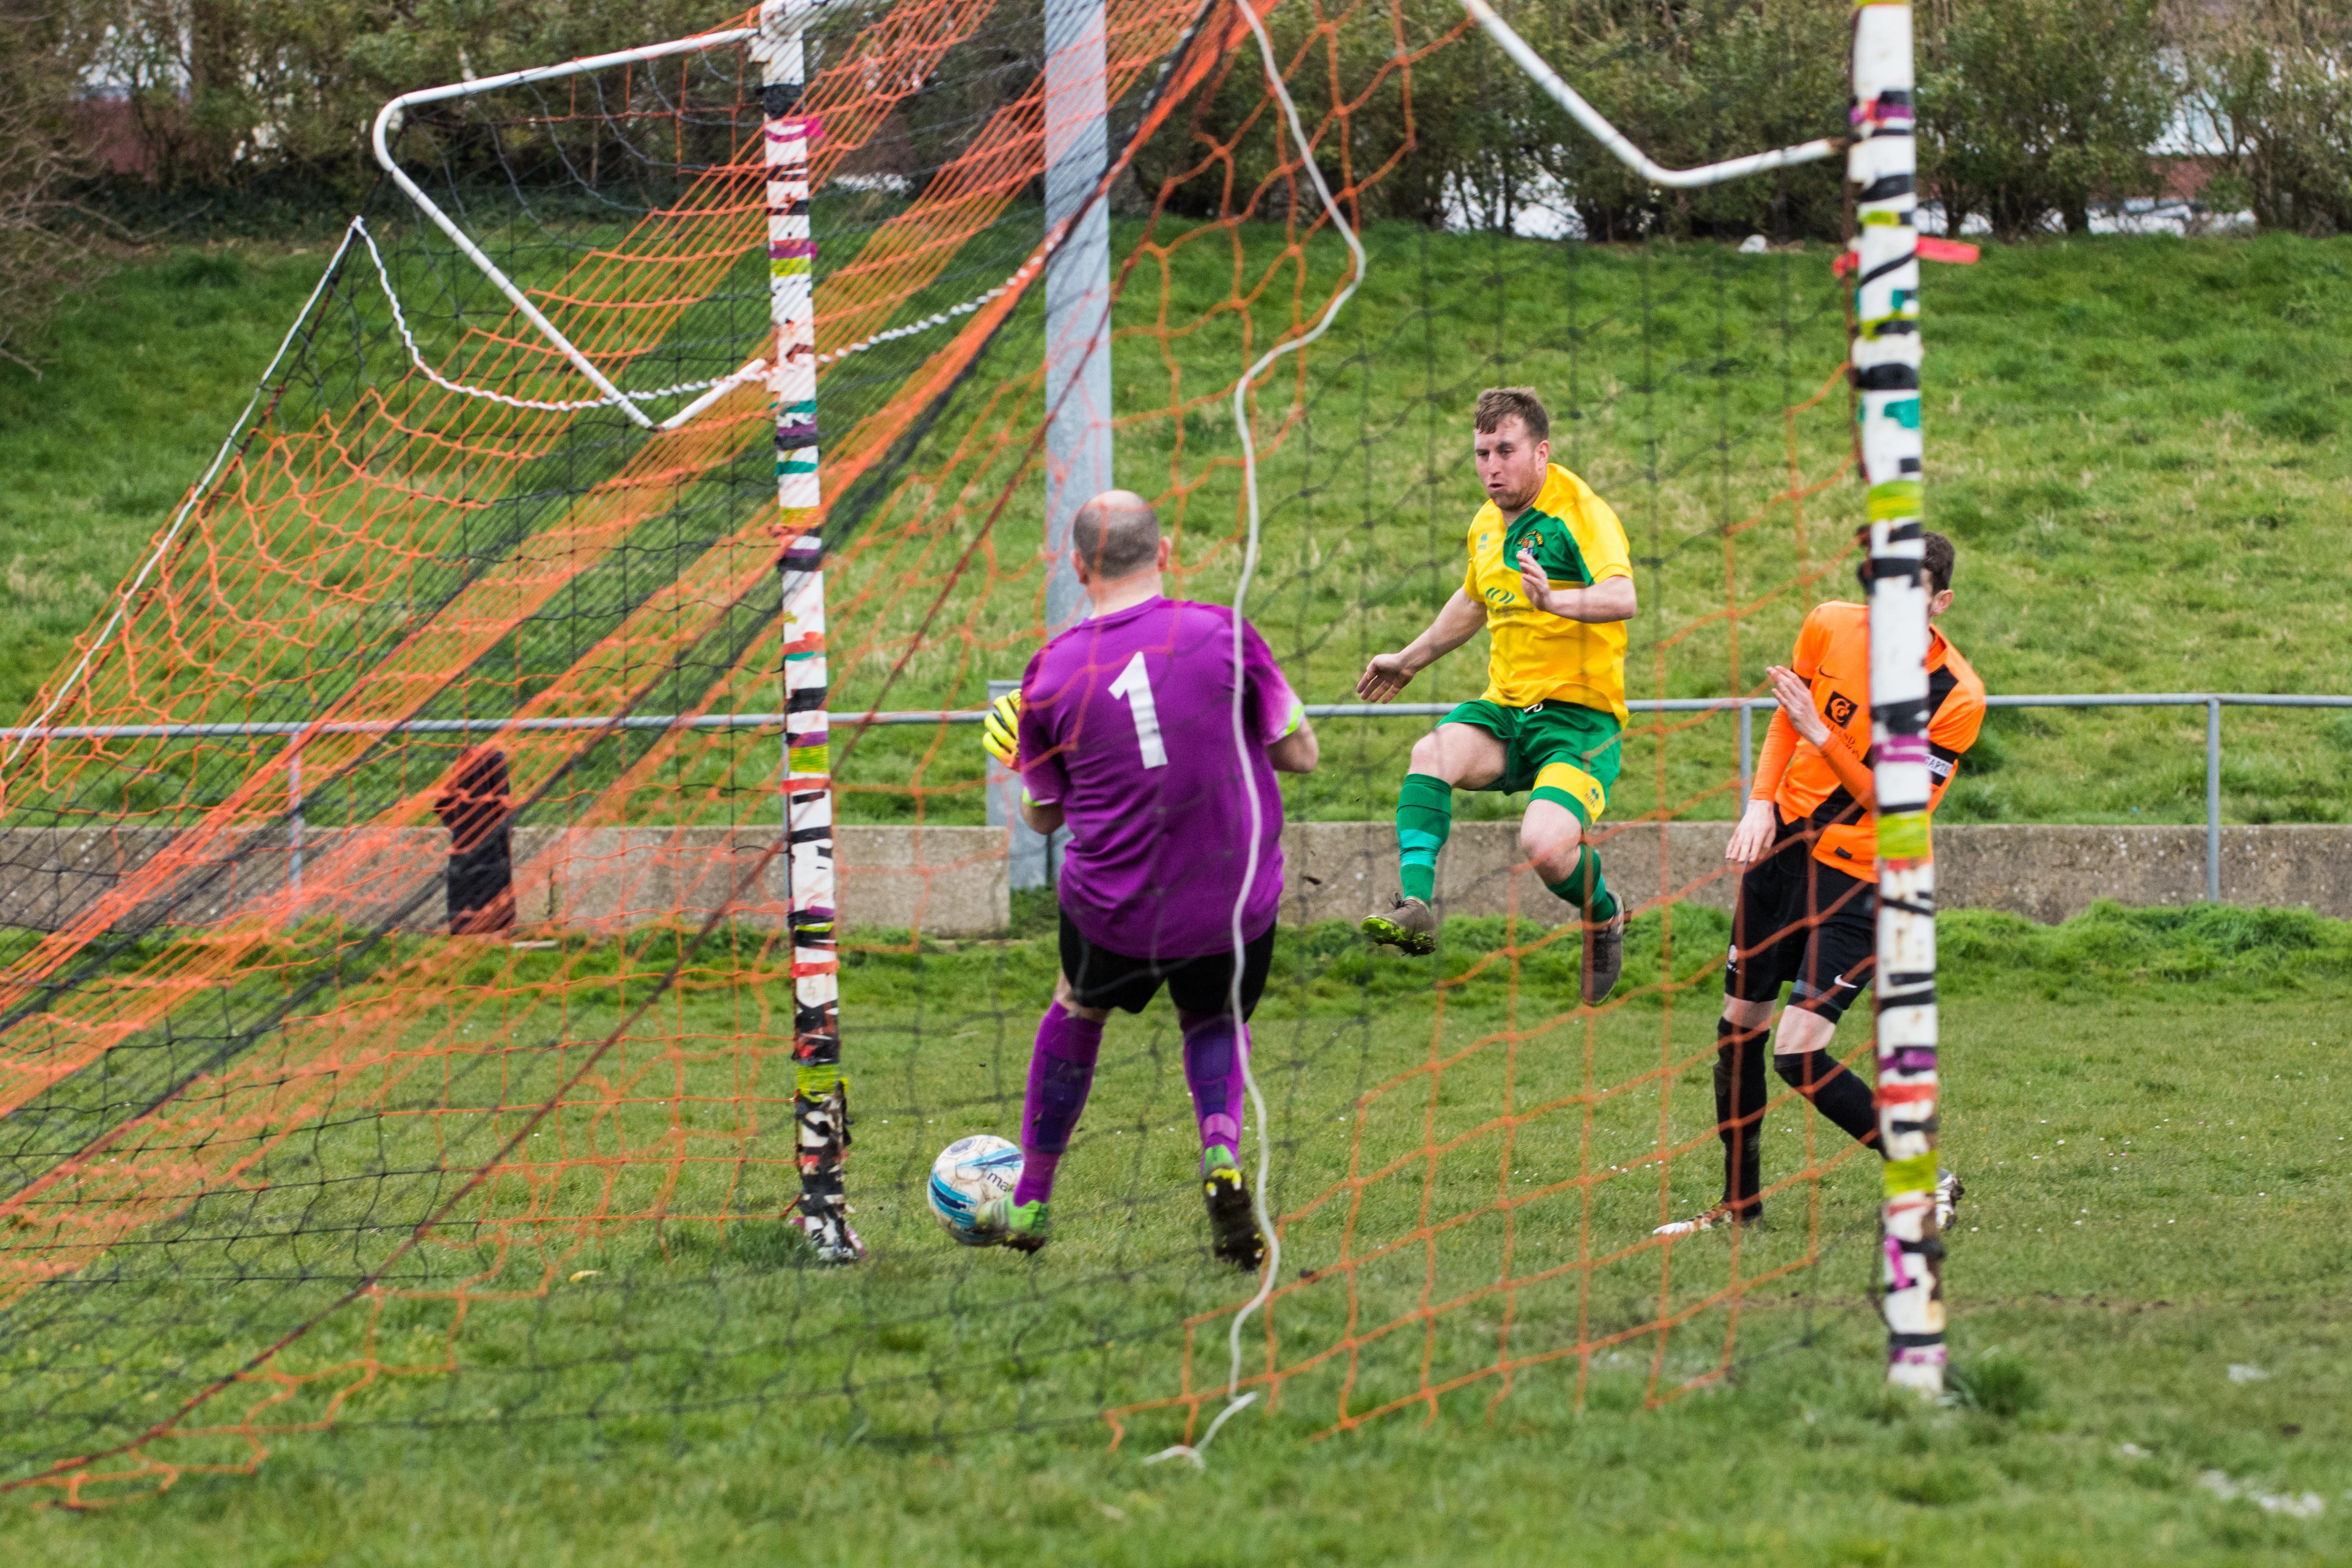 DAVID_JEFFERY Mile Oak FC vs Hailsham Town FC 24.03.18 57